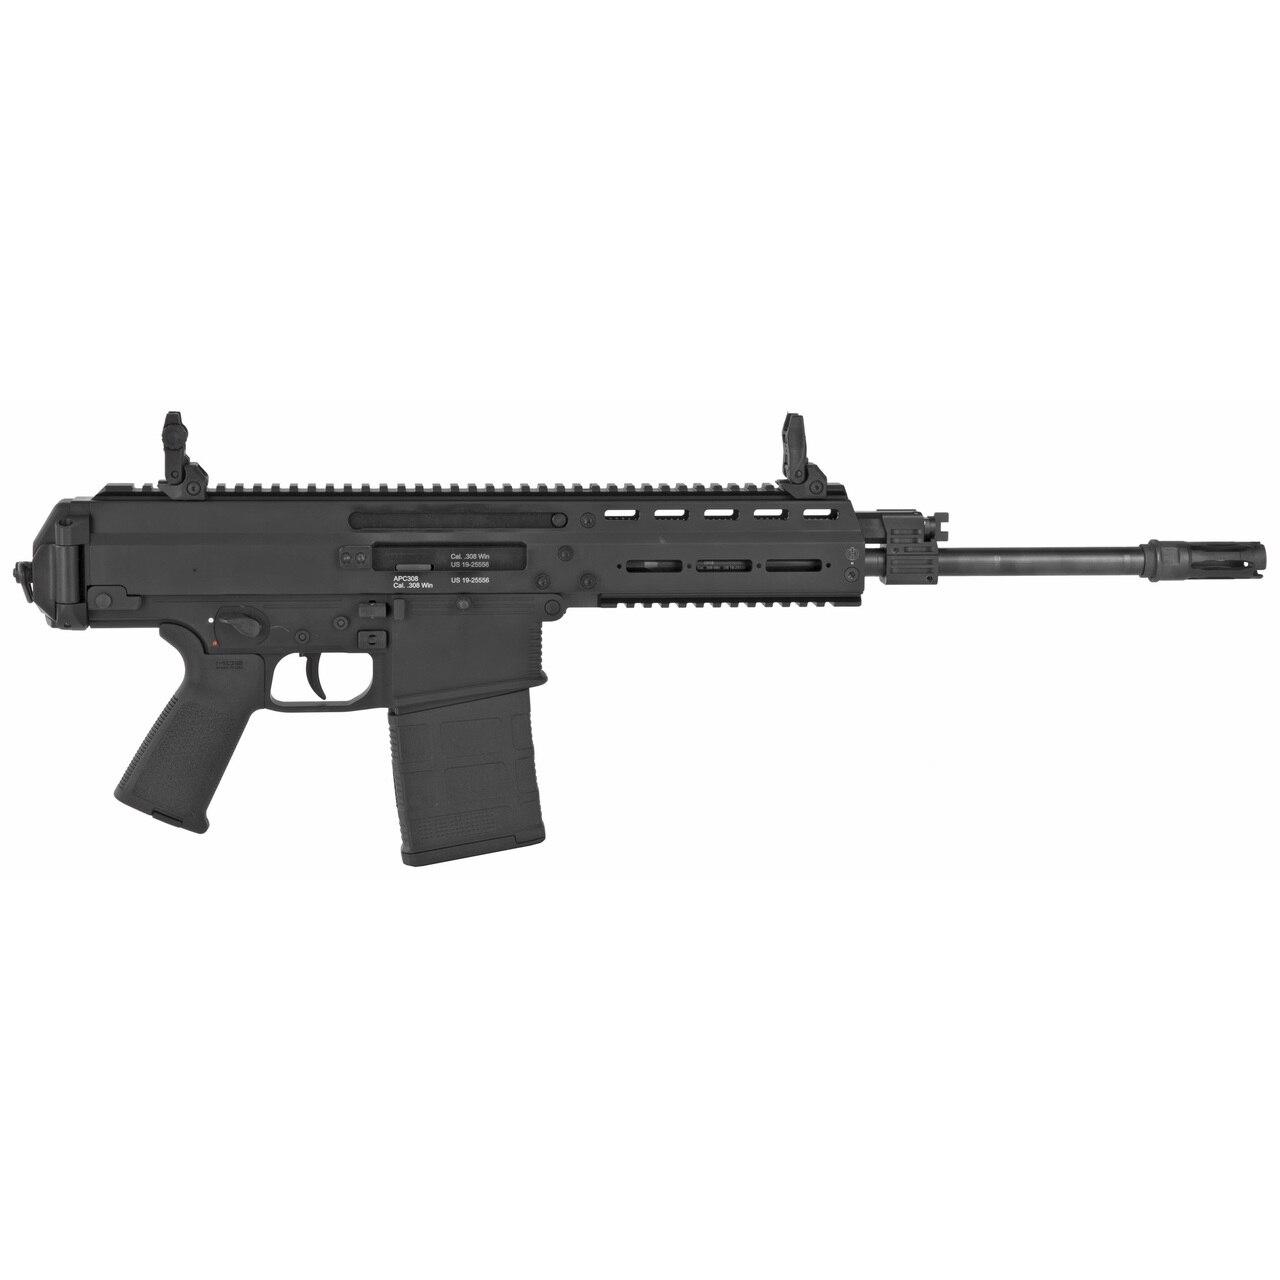 "Image of B&T APC308 Pistol, .308/7.62x51 14.3"" Barrel, Steel Frame, Black Finish, 20rd Mag"